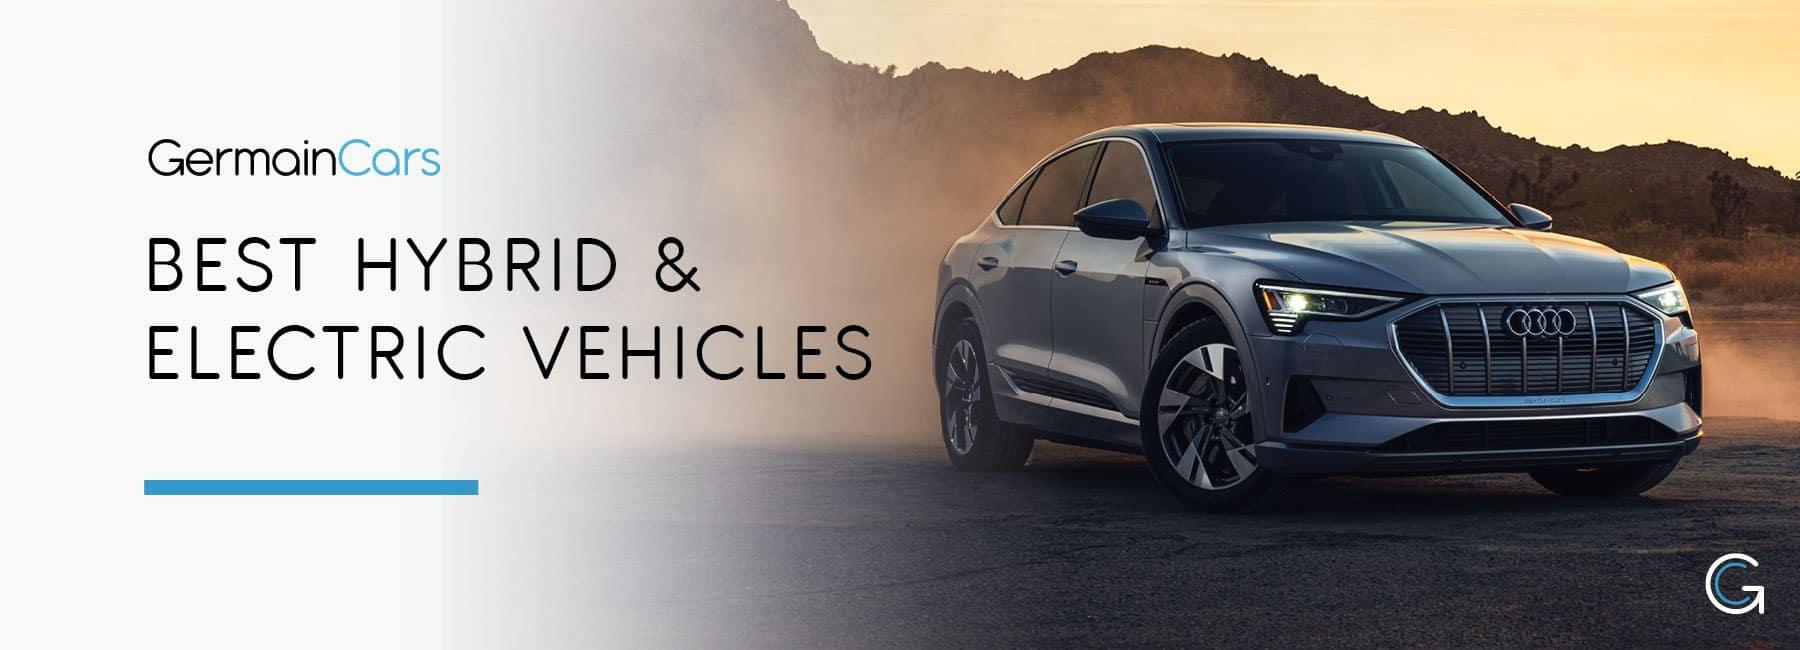 Best Hybrid & Electric Vehicles